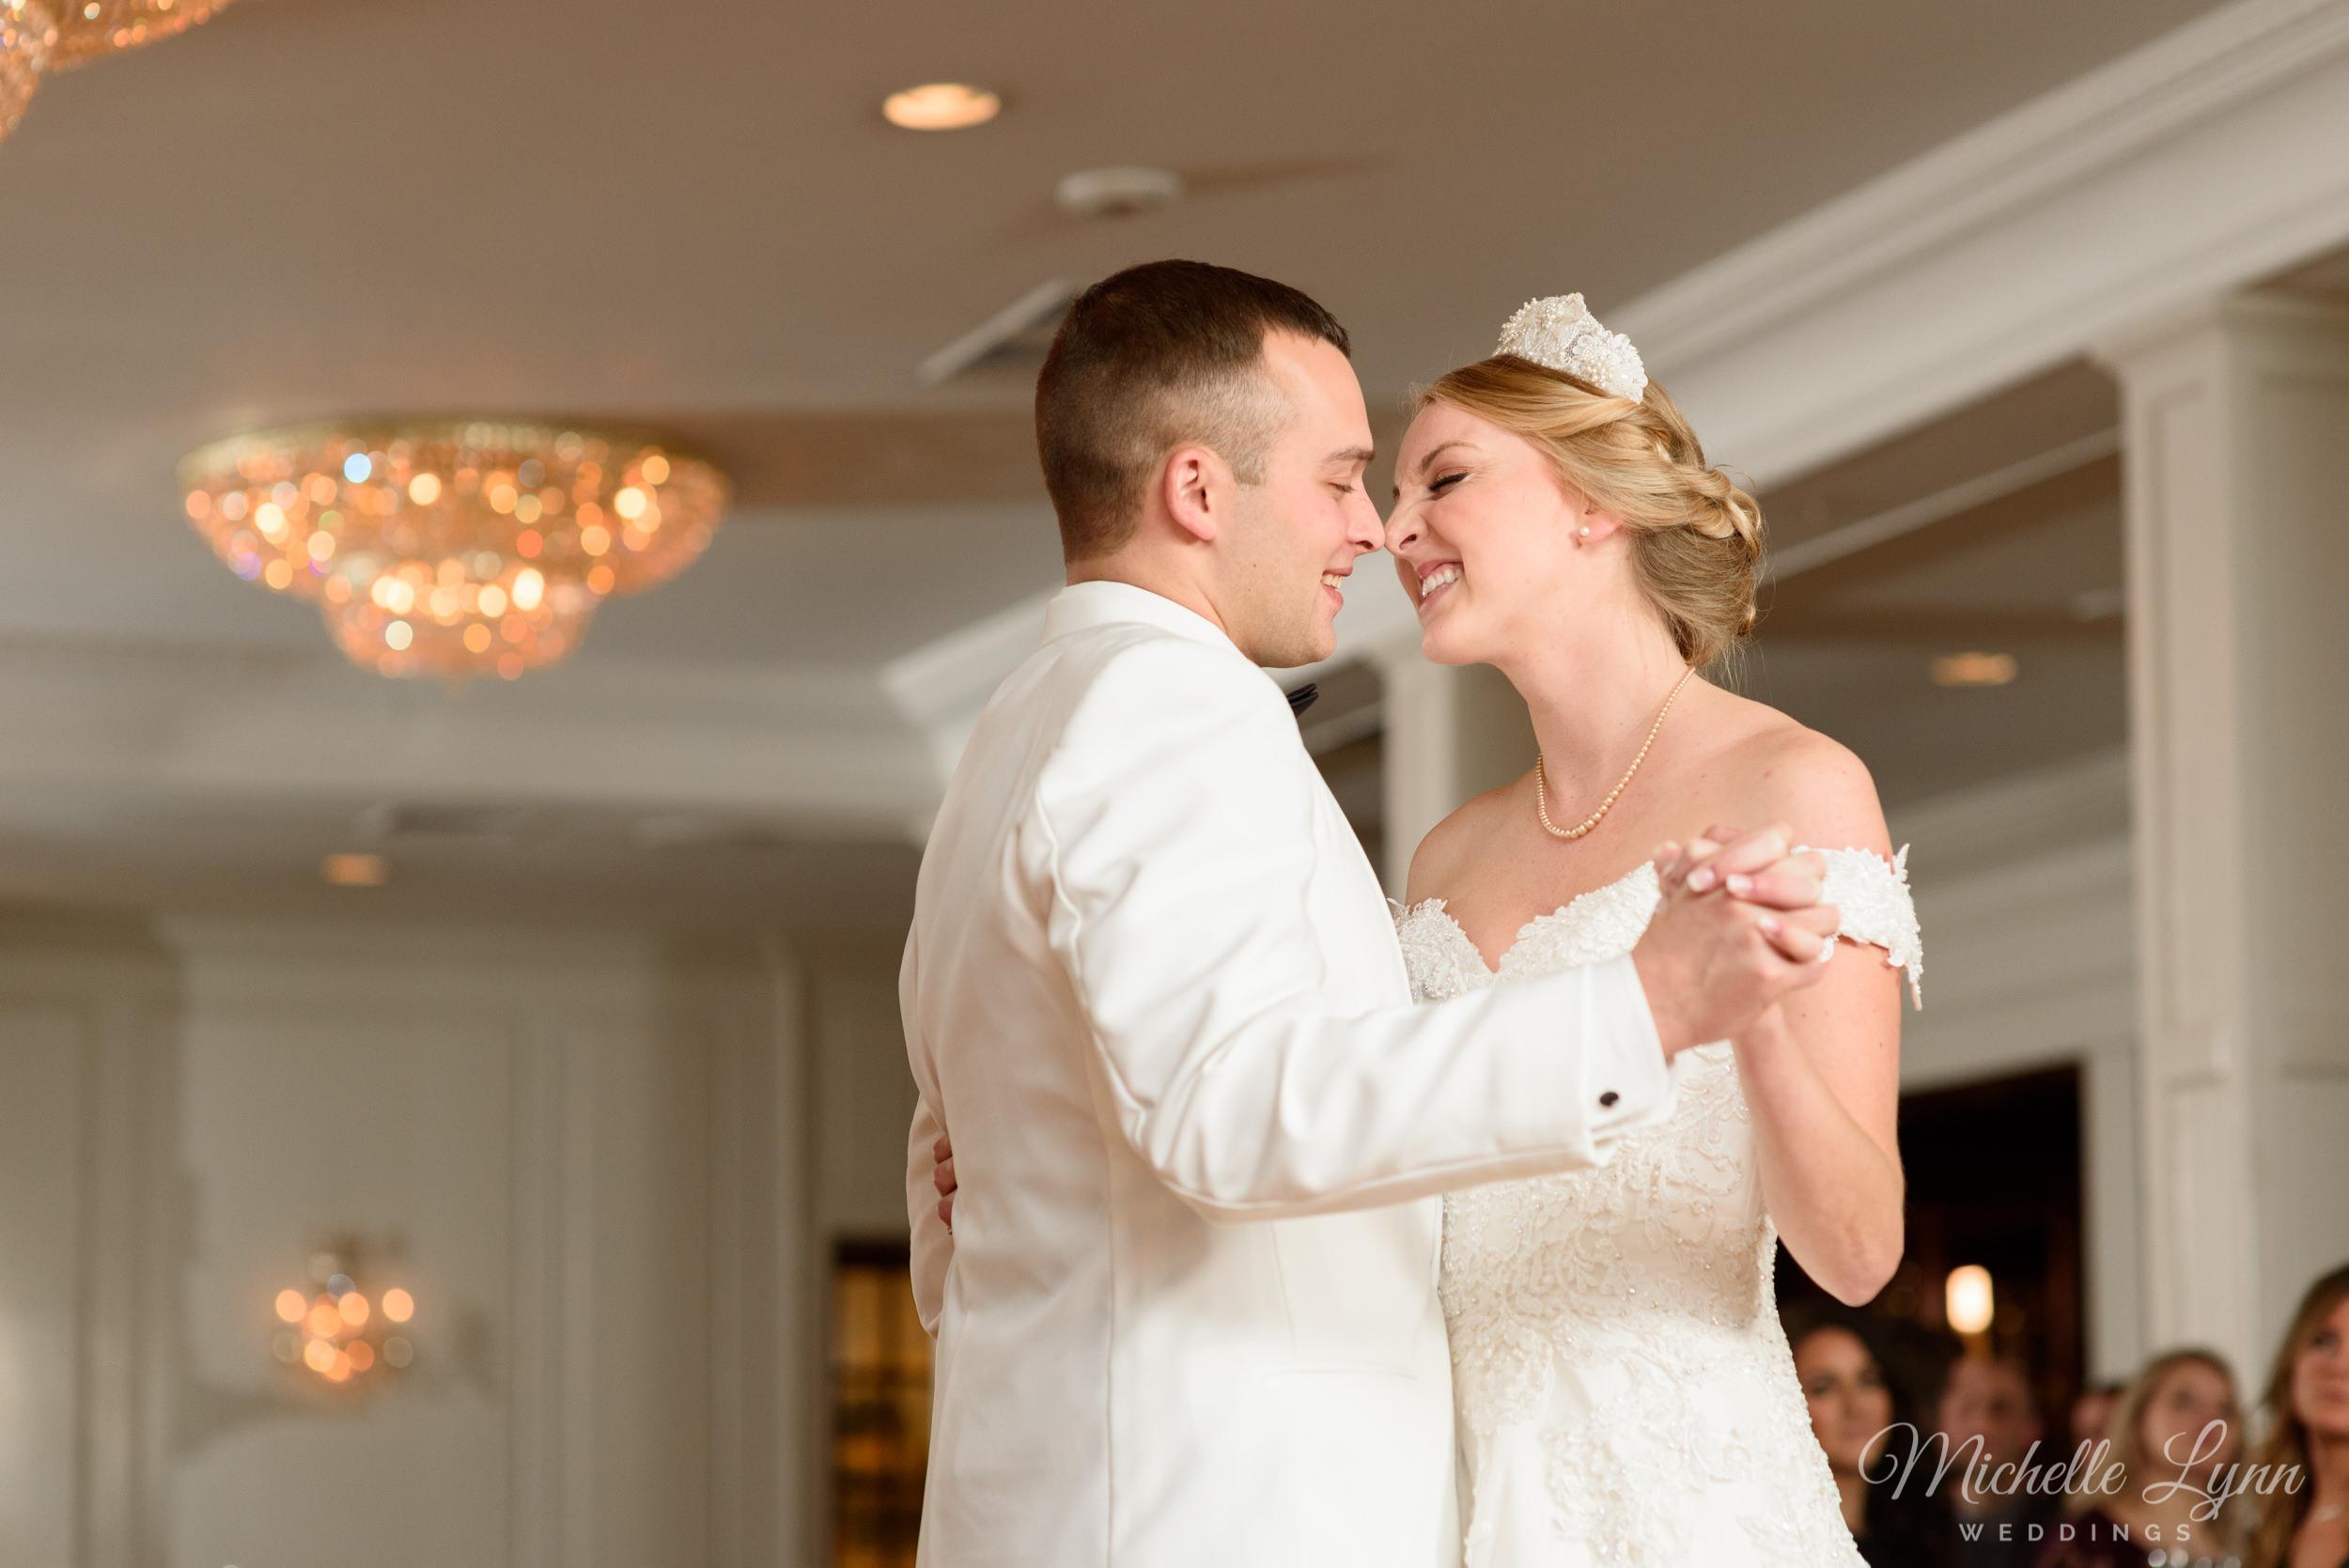 william-penn-inn-wedding-photography-mlw-83.jpg